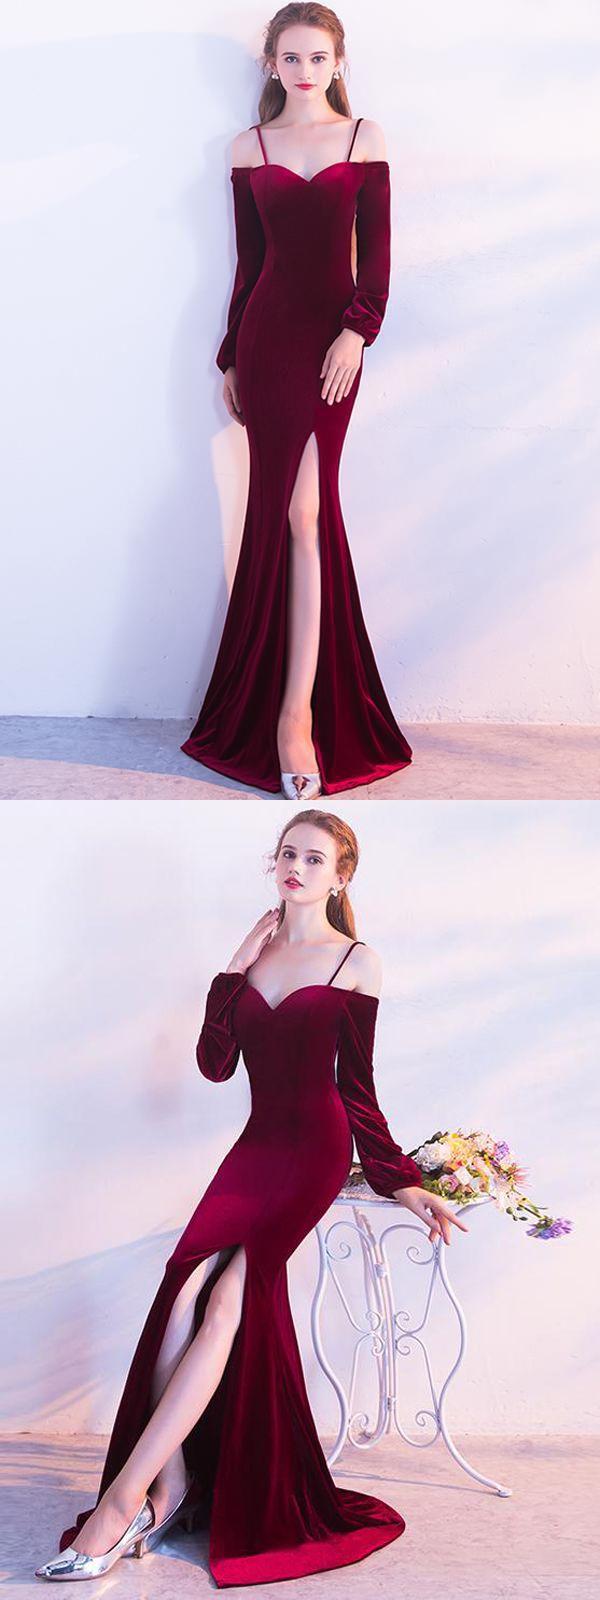 Unique sheath spaghetti straps long sleeves burgundy long prom dress